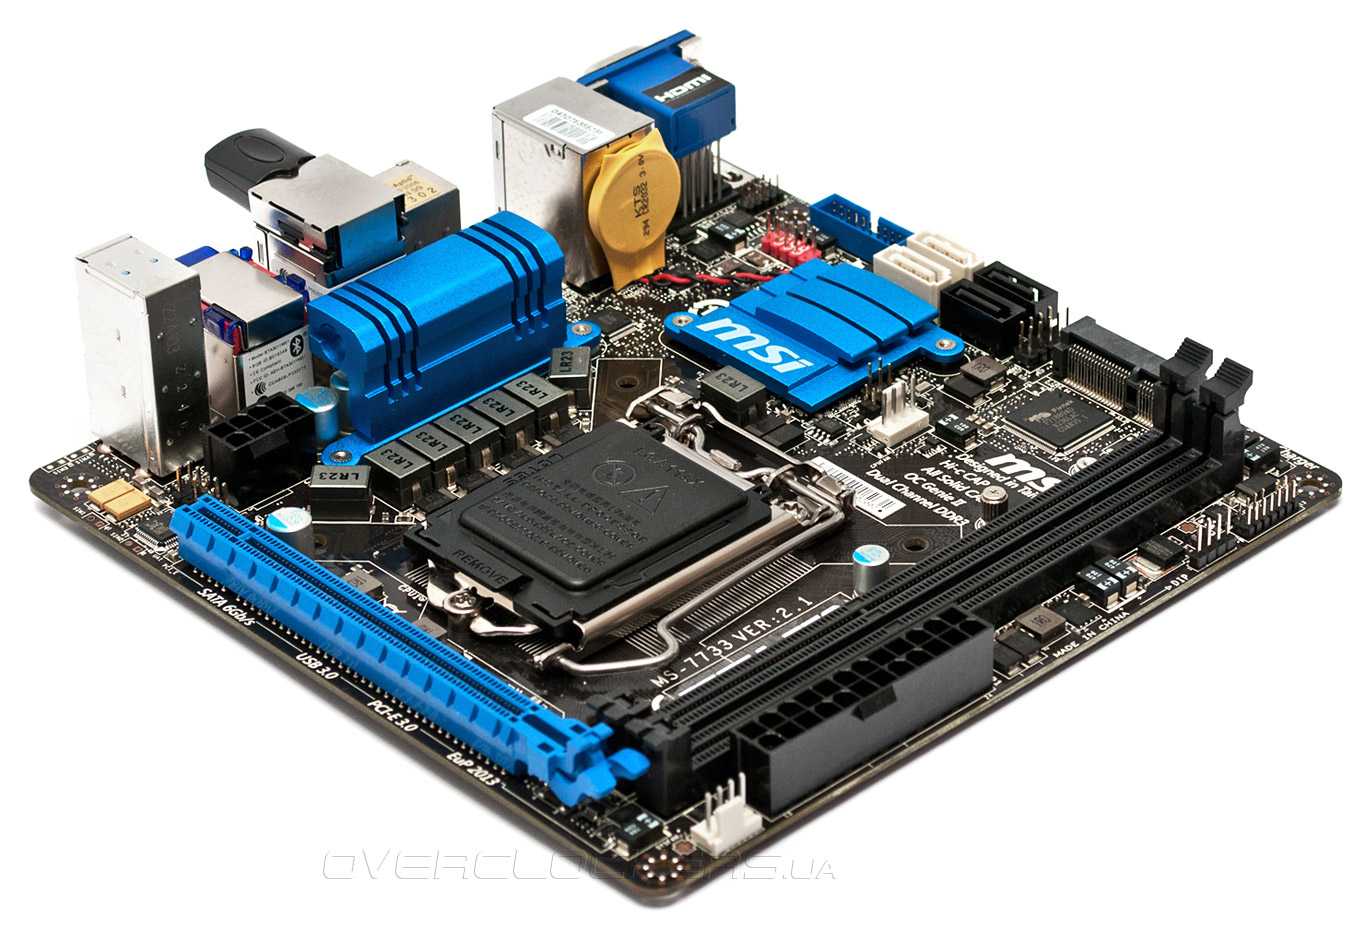 MSI Z77IA-E51 INTEL SMART CONNECT TECHNOLOGY WINDOWS 7 DRIVER DOWNLOAD